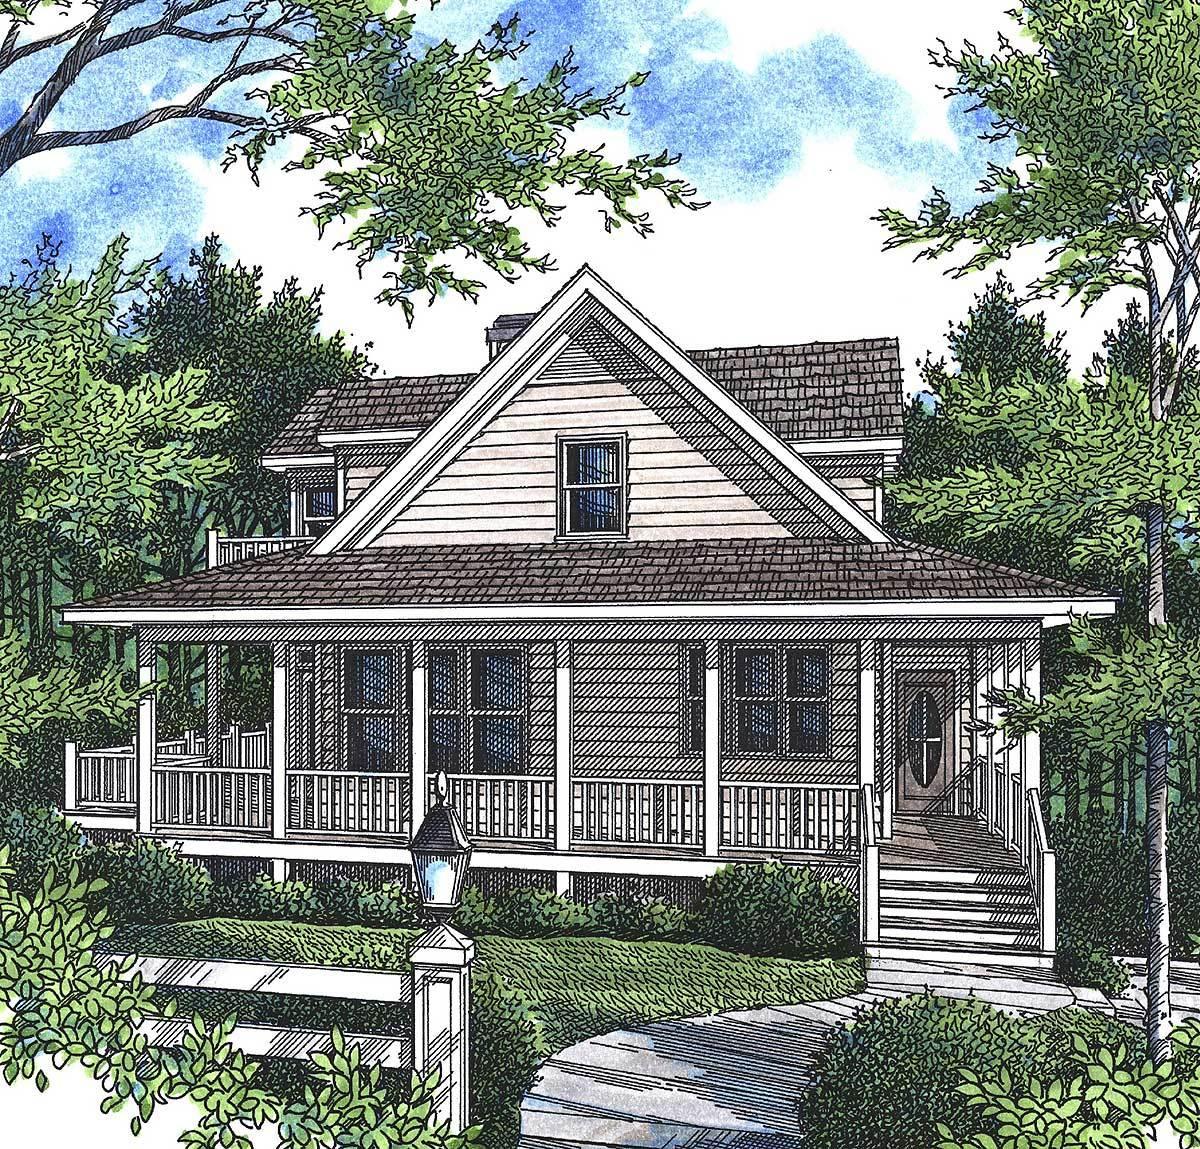 Perfect Mountain Cottage - 92007vs Architectural Design